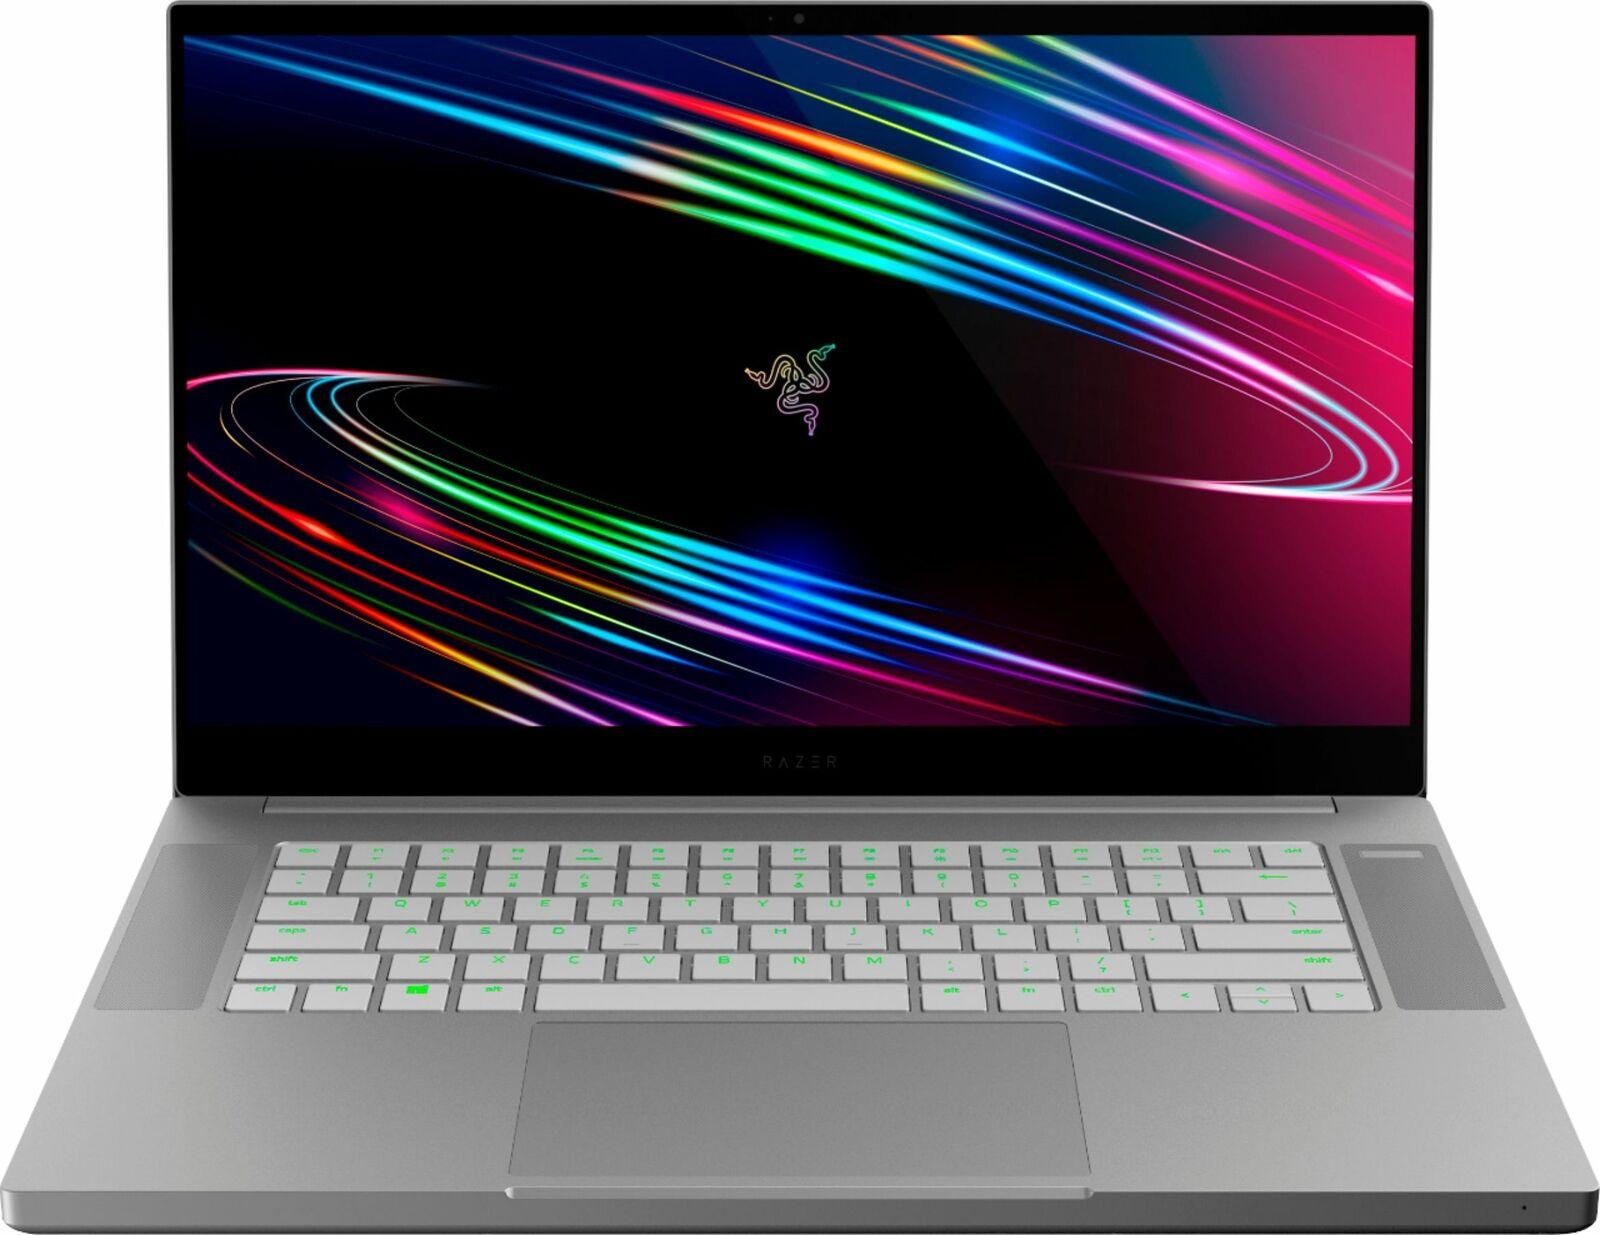 Razer Blade 15 (RZ09-03287EM2-REFB) 15.6″ OLED 4K 60Hz Gaming Laptop, 10th Core i7 6-Core, 16GB RAM, 512GB SSD